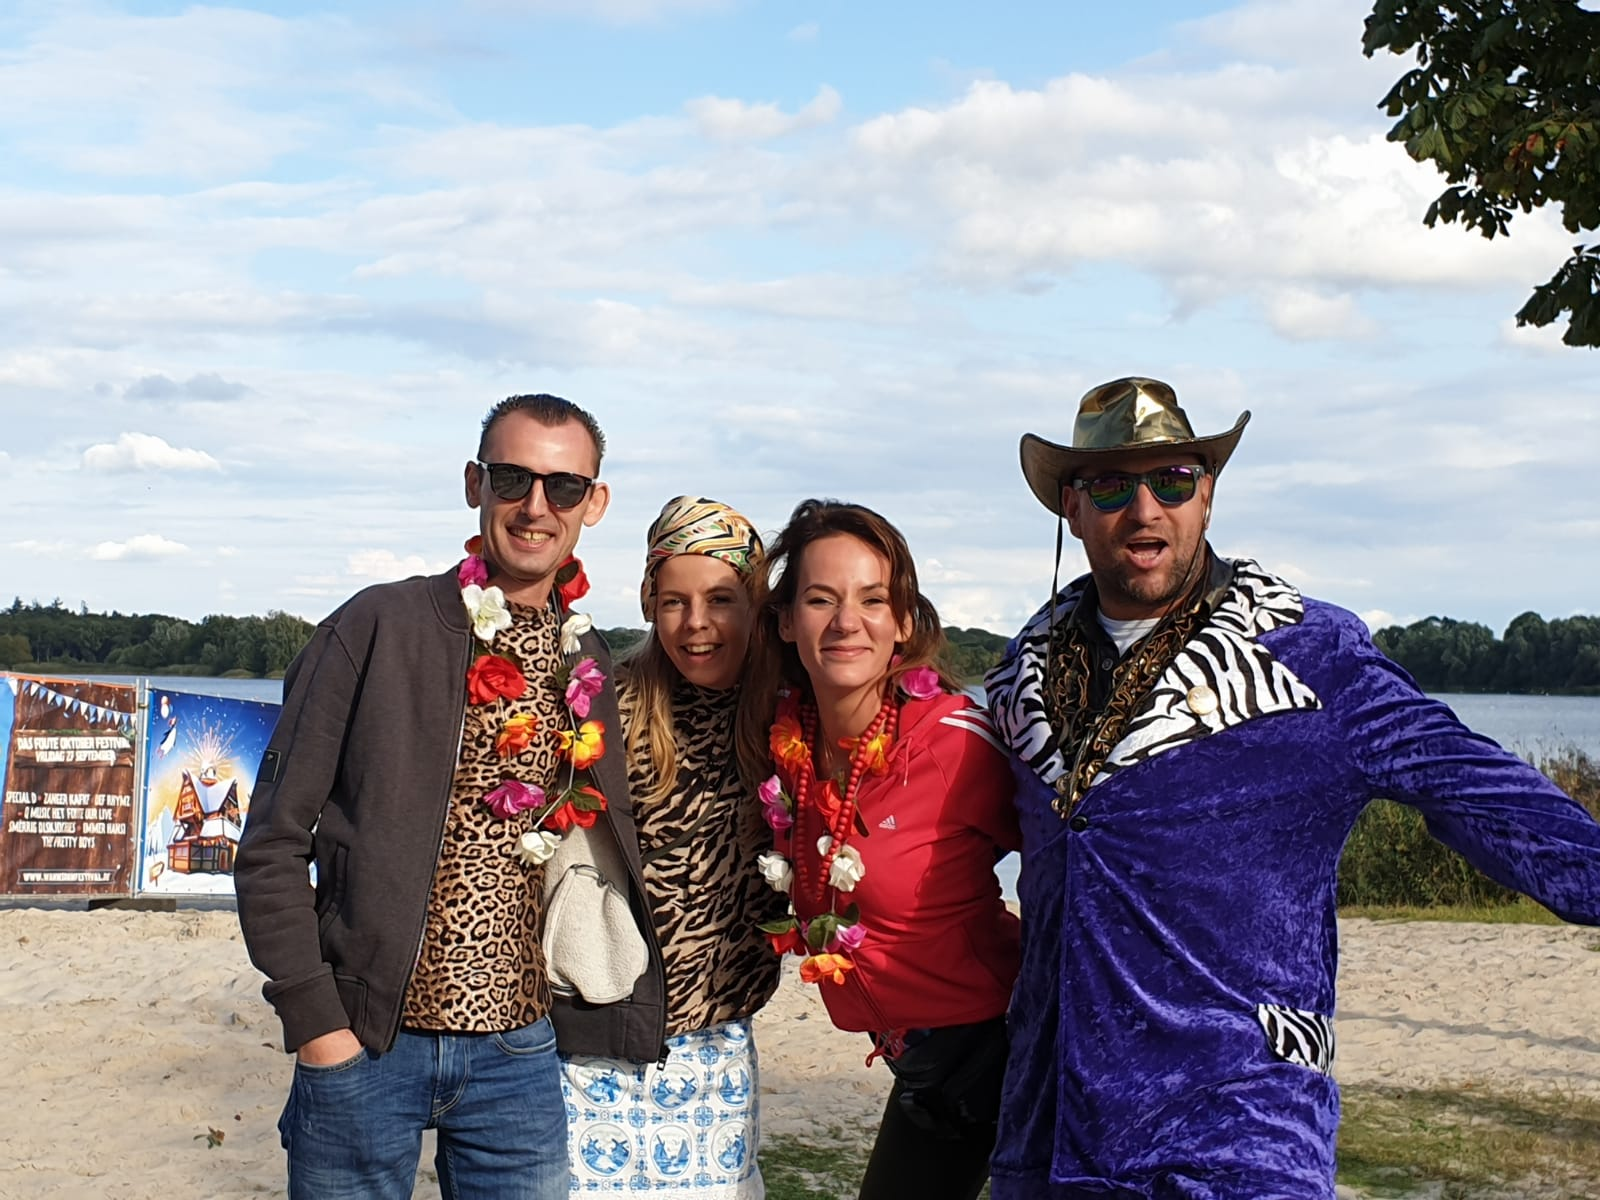 Foutdoor festival